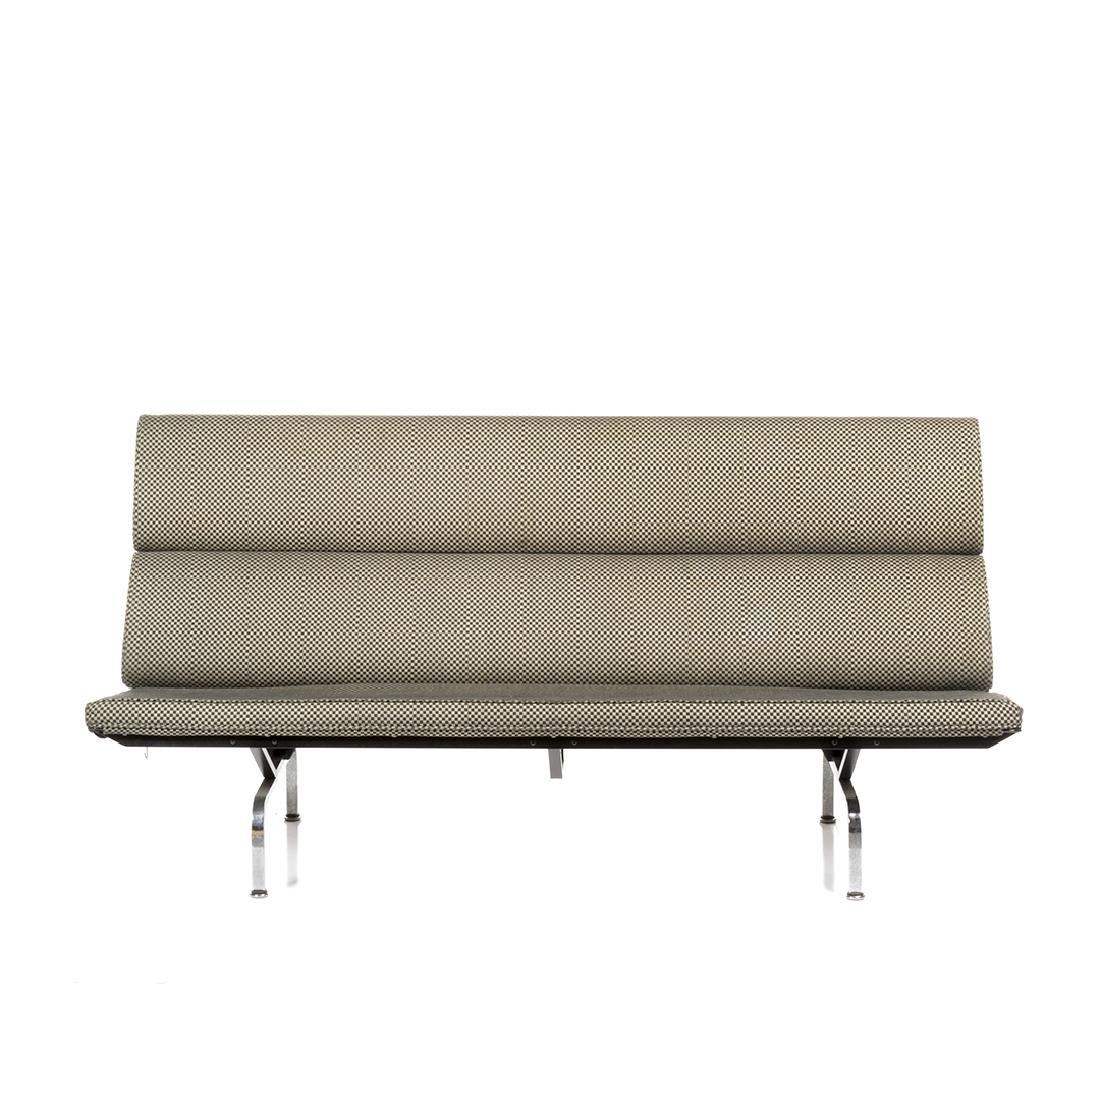 Charles and Ray Eames Compact Sofa - 2